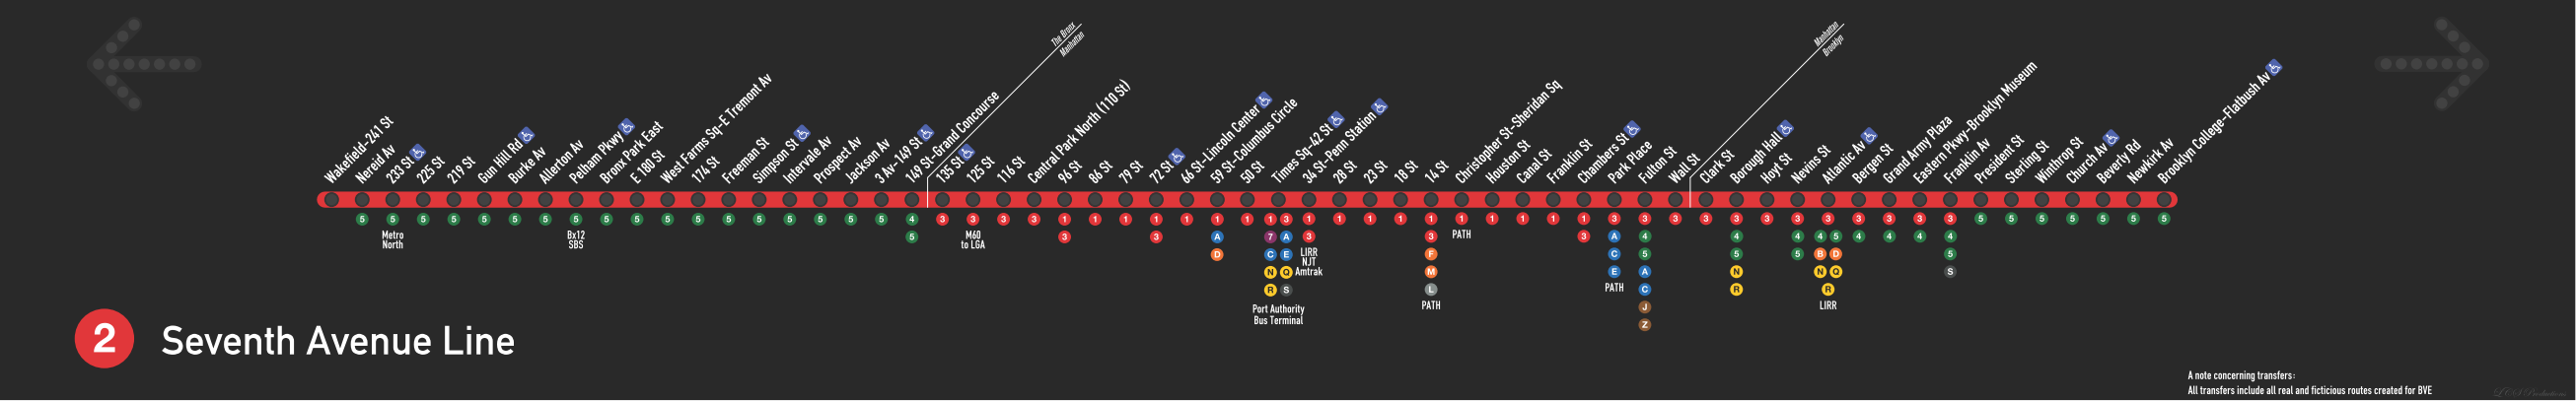 1 Train Nyc Map.A Train Map Nyc Stonefalls Treasure Map 1